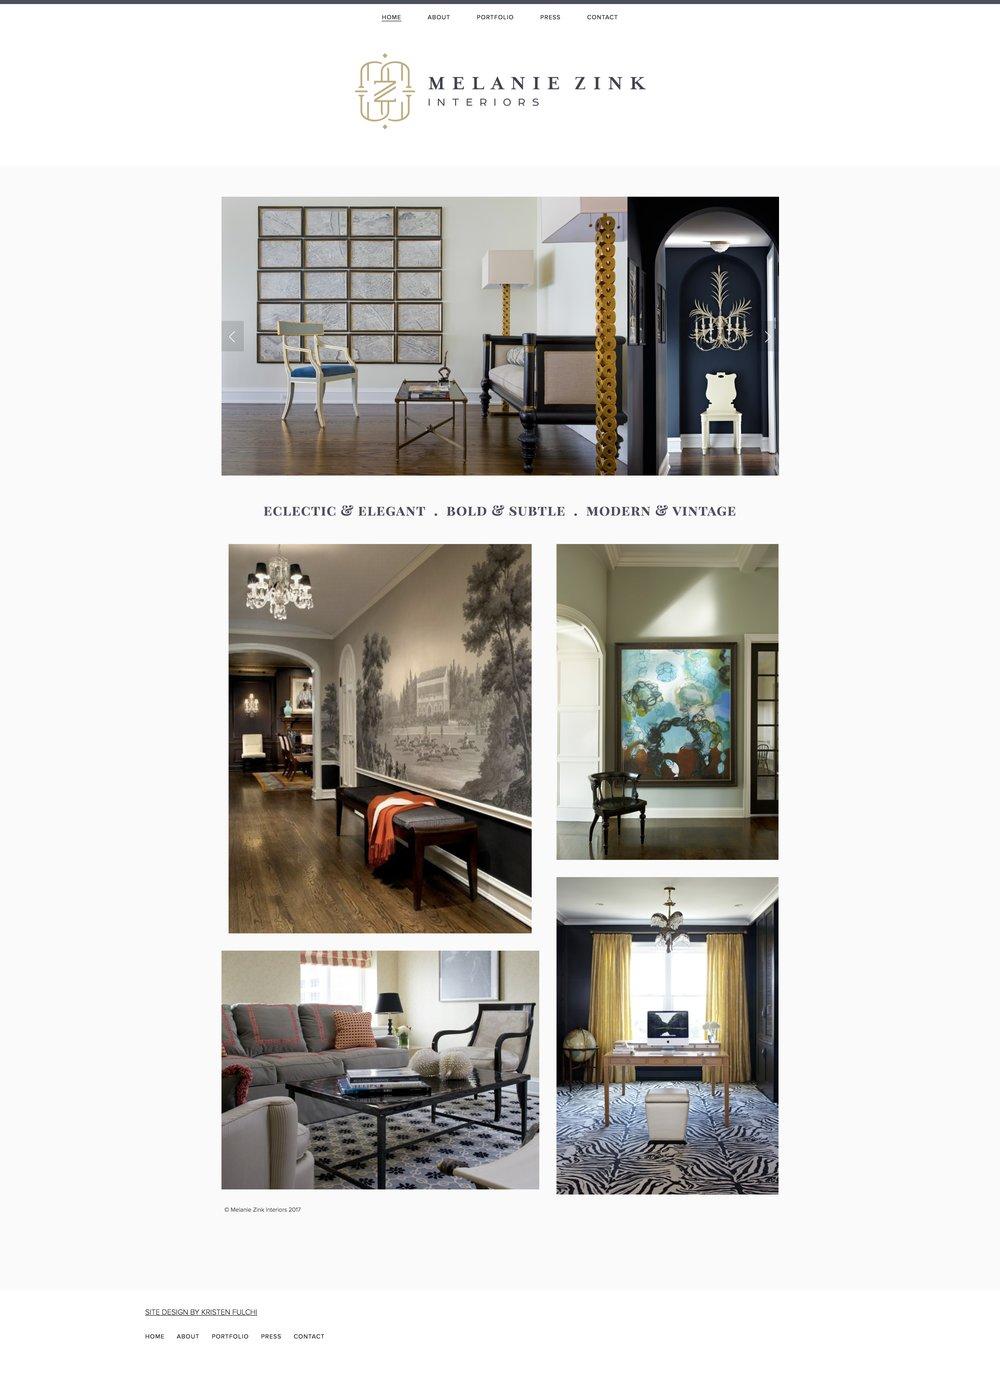 kristen-fulchi-design-studio-custom-squarespace-website-design-melanie-zink-interiors-design-web-design-for-creatives.jpg